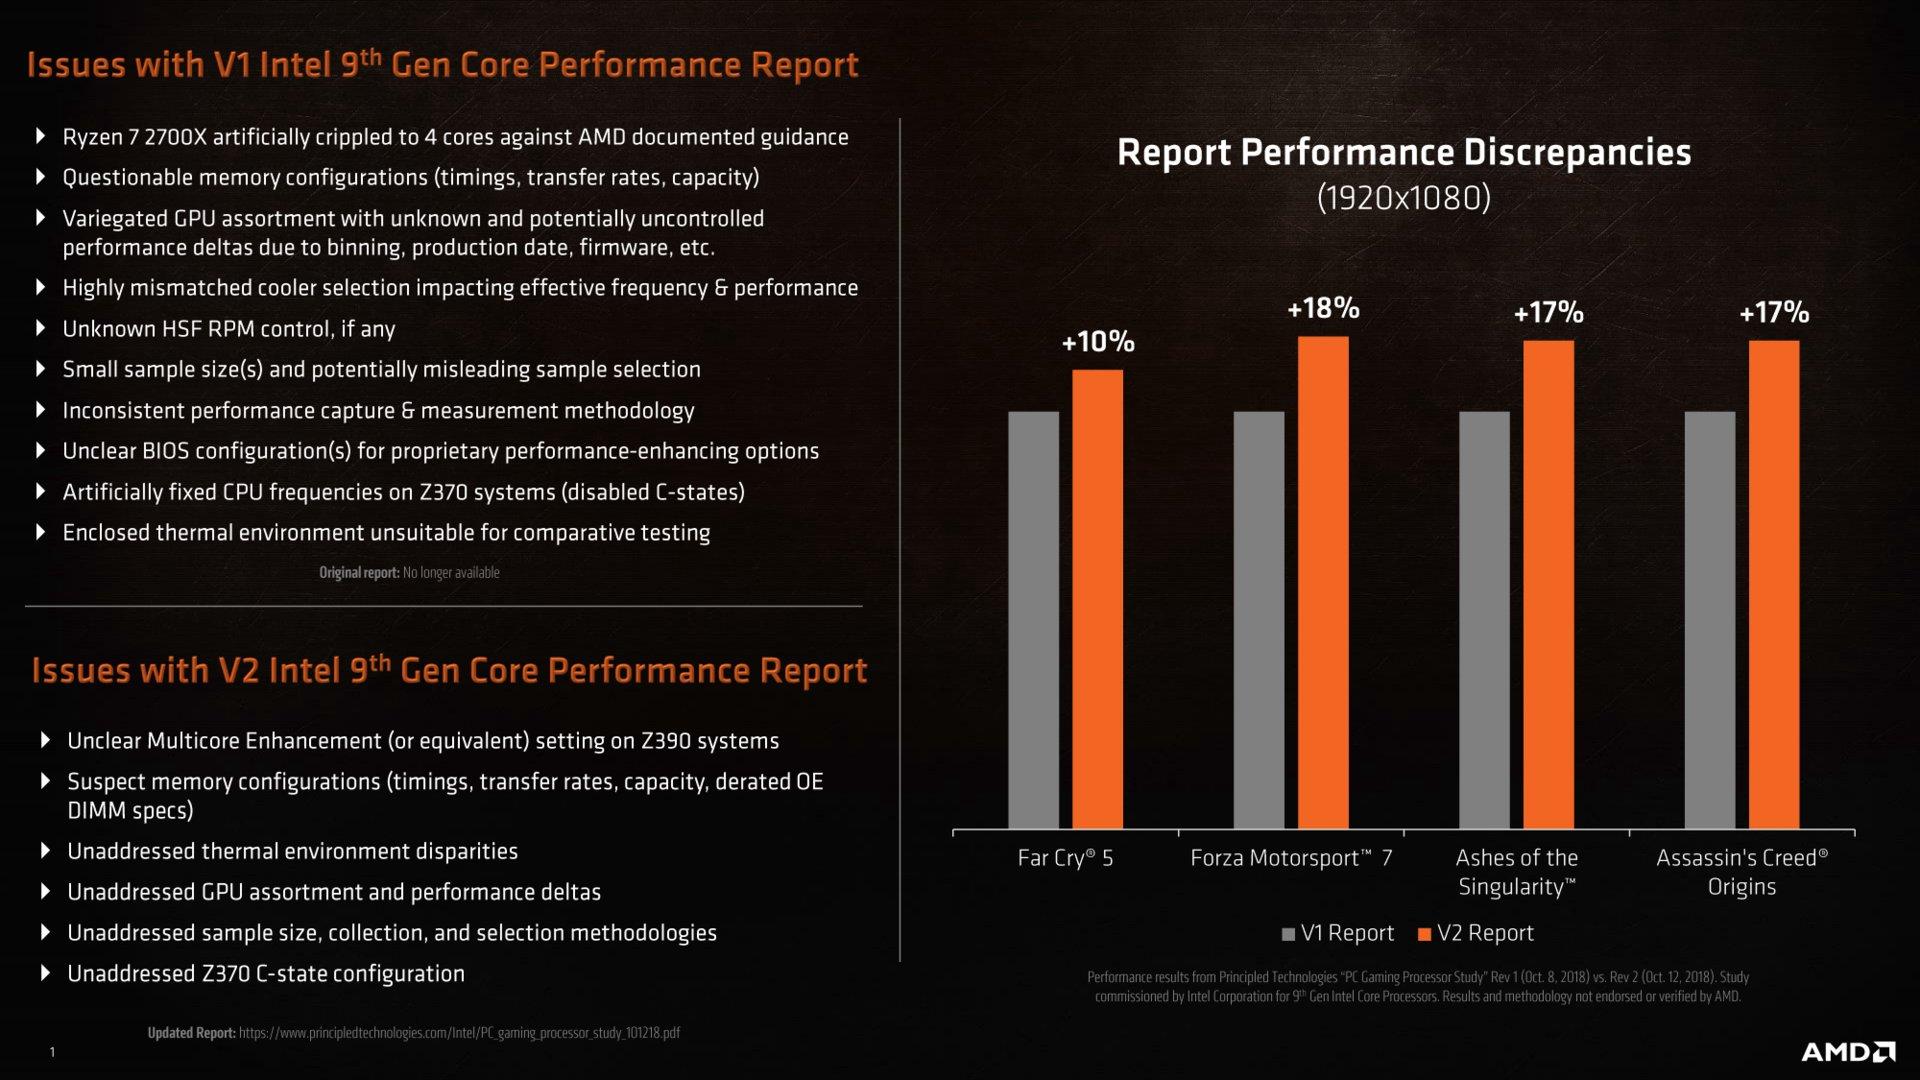 AMDs Kritik an den Benchmarks von Principled Technologies